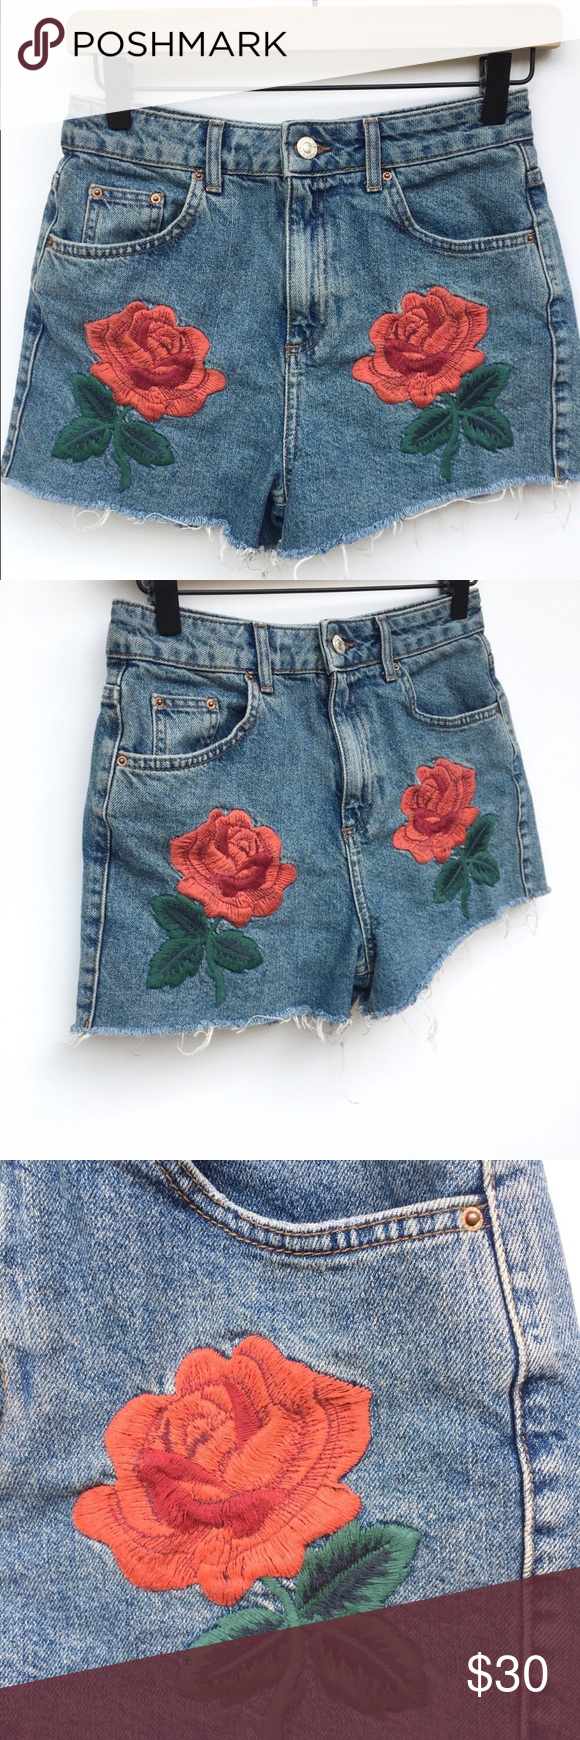 edf014e50e Topshop Moto Rose Embroidered Mom Denim Shorts Topshop Moto Rose Embroidered  Mom Denim Shorts Colors: Blue, Green, Red Condition: EUC Feature: Five  Pockets ...